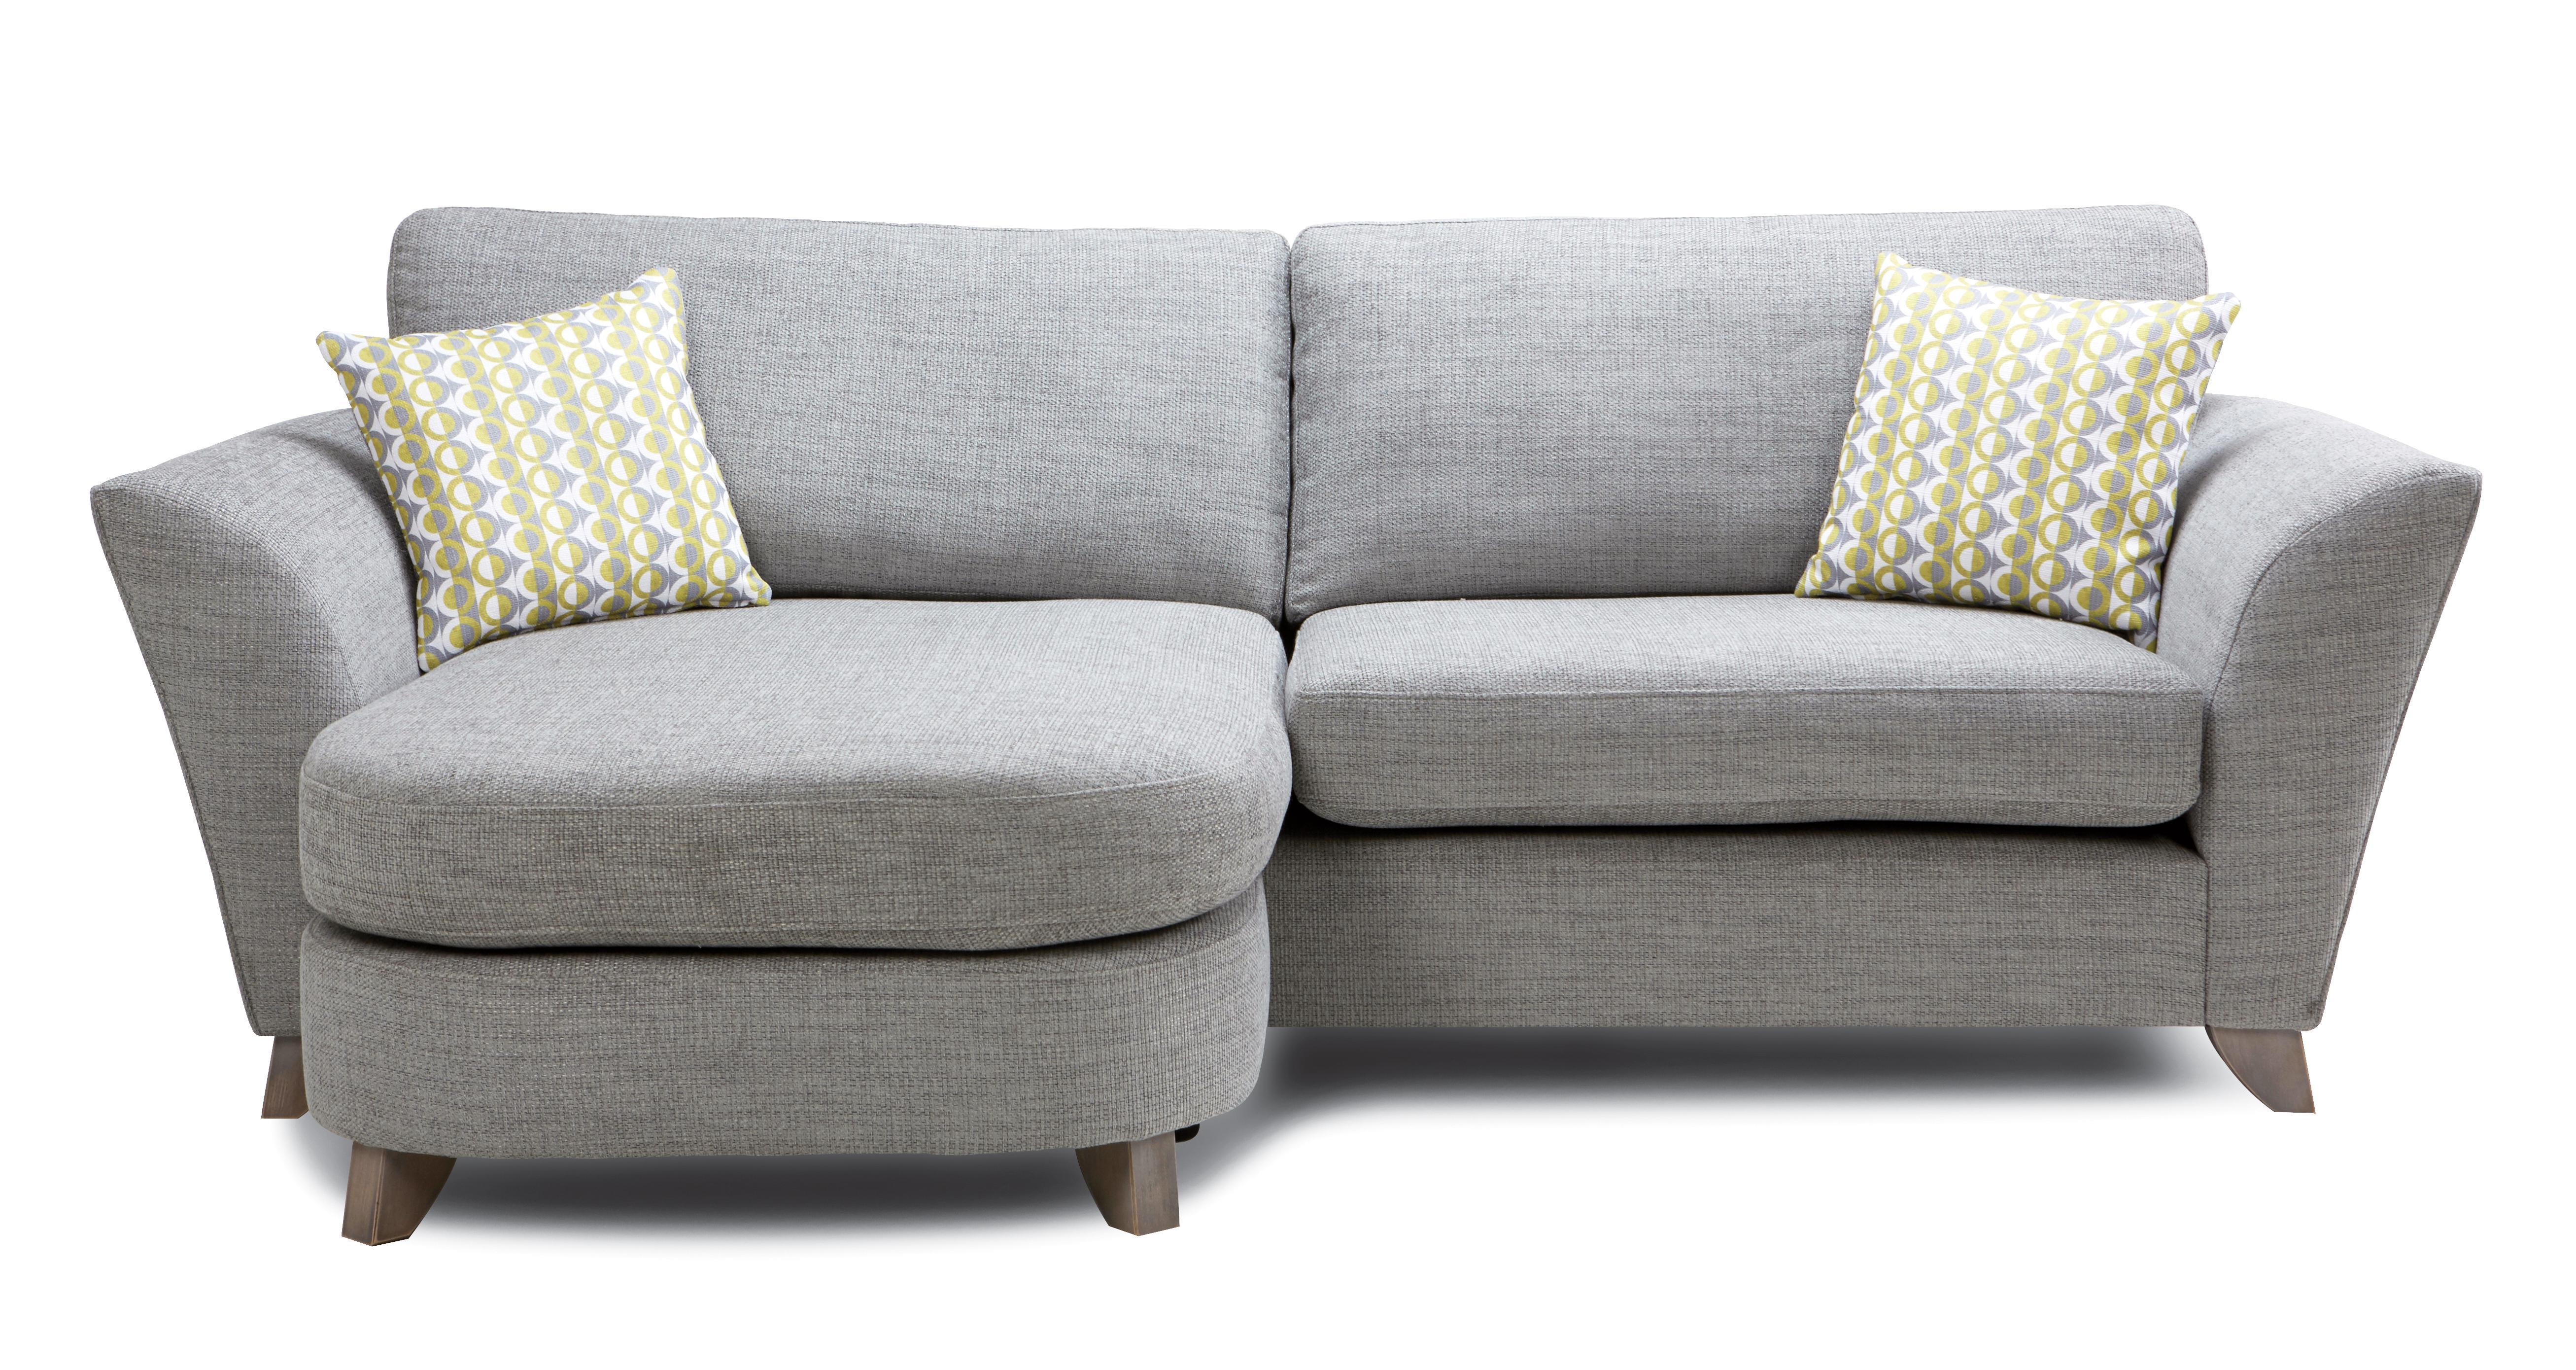 GXD Eliana Formal Back 4 Seater Lounger Sofa